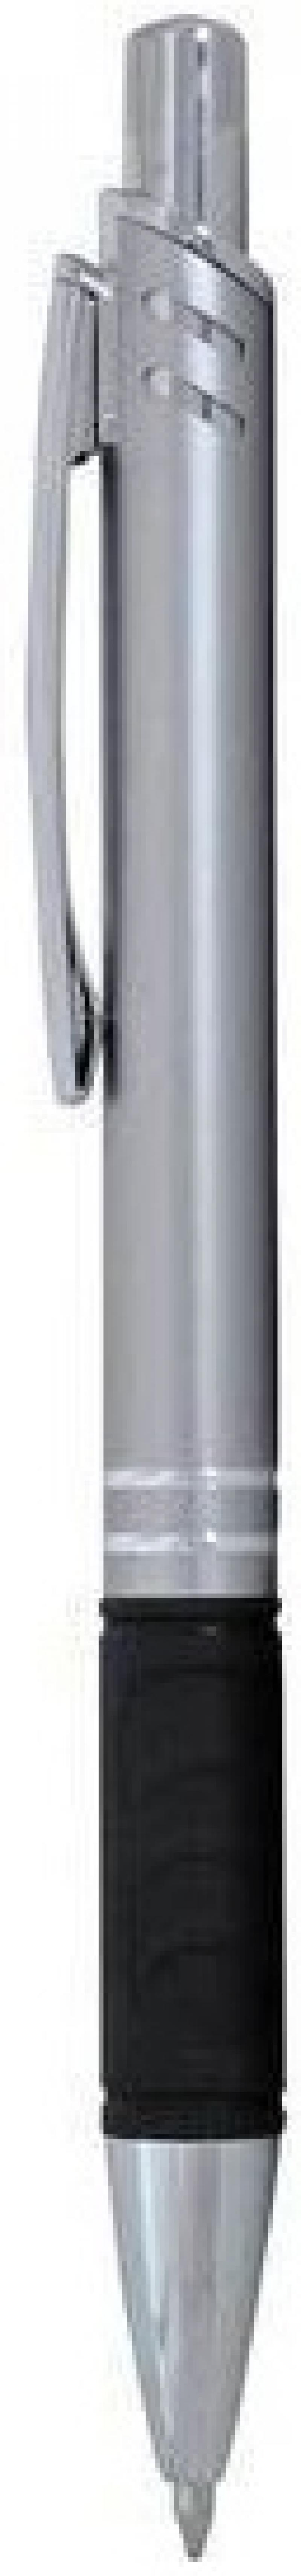 Шариковая ручка автоматическая Index IMWT1134/SL/бшк синий 0.5 мм IMWT1134/SL/бшк цена